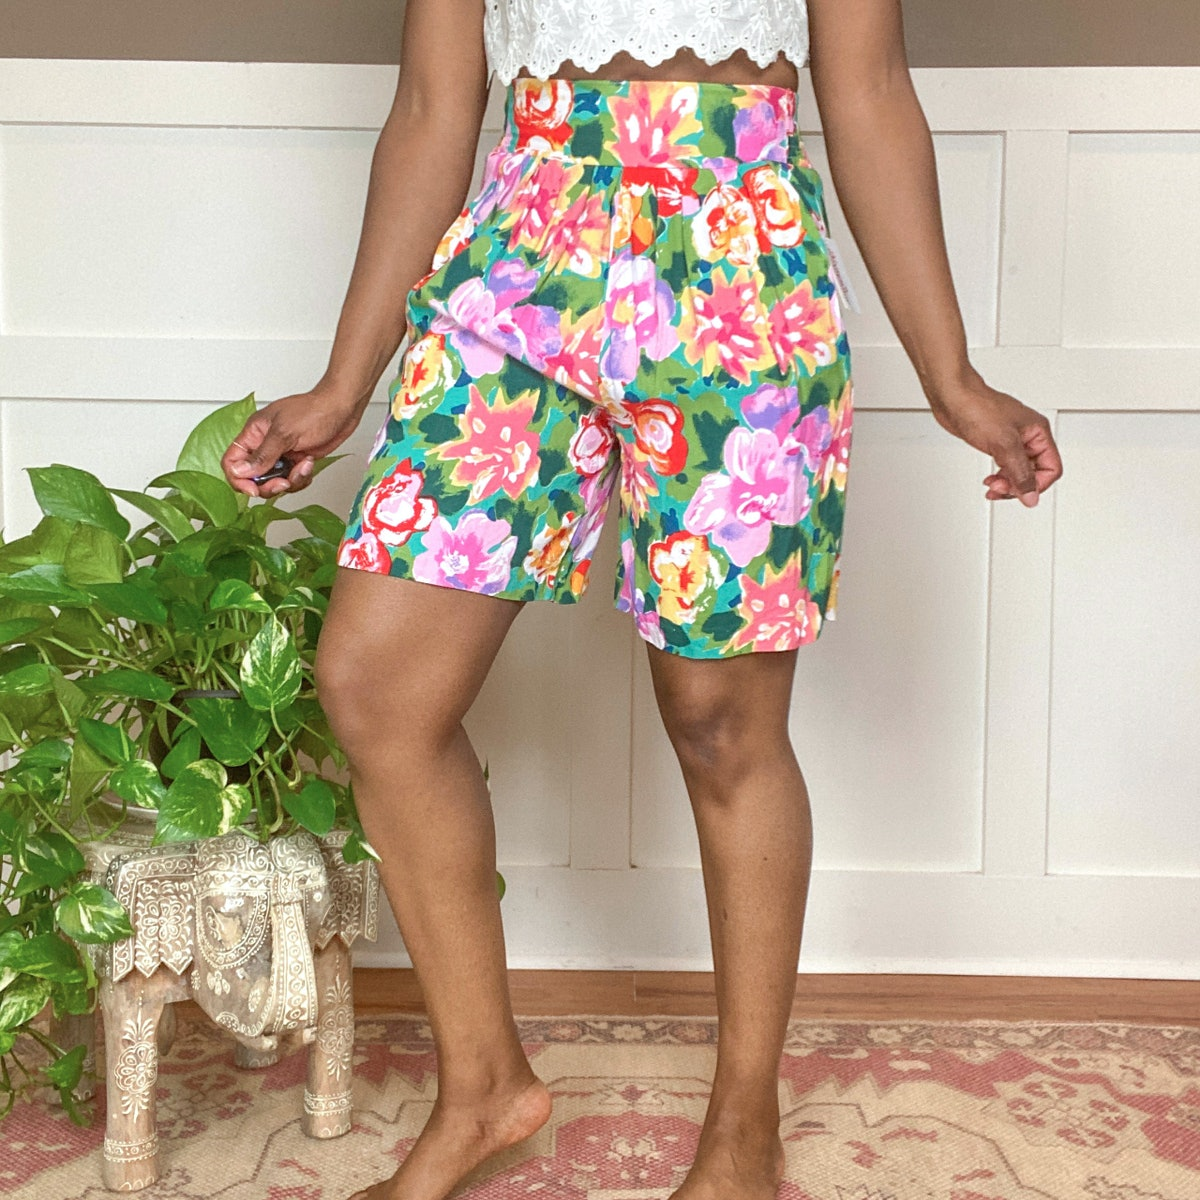 @nancysvtgshop Vintage '90s High-Rise Rayon Shorts